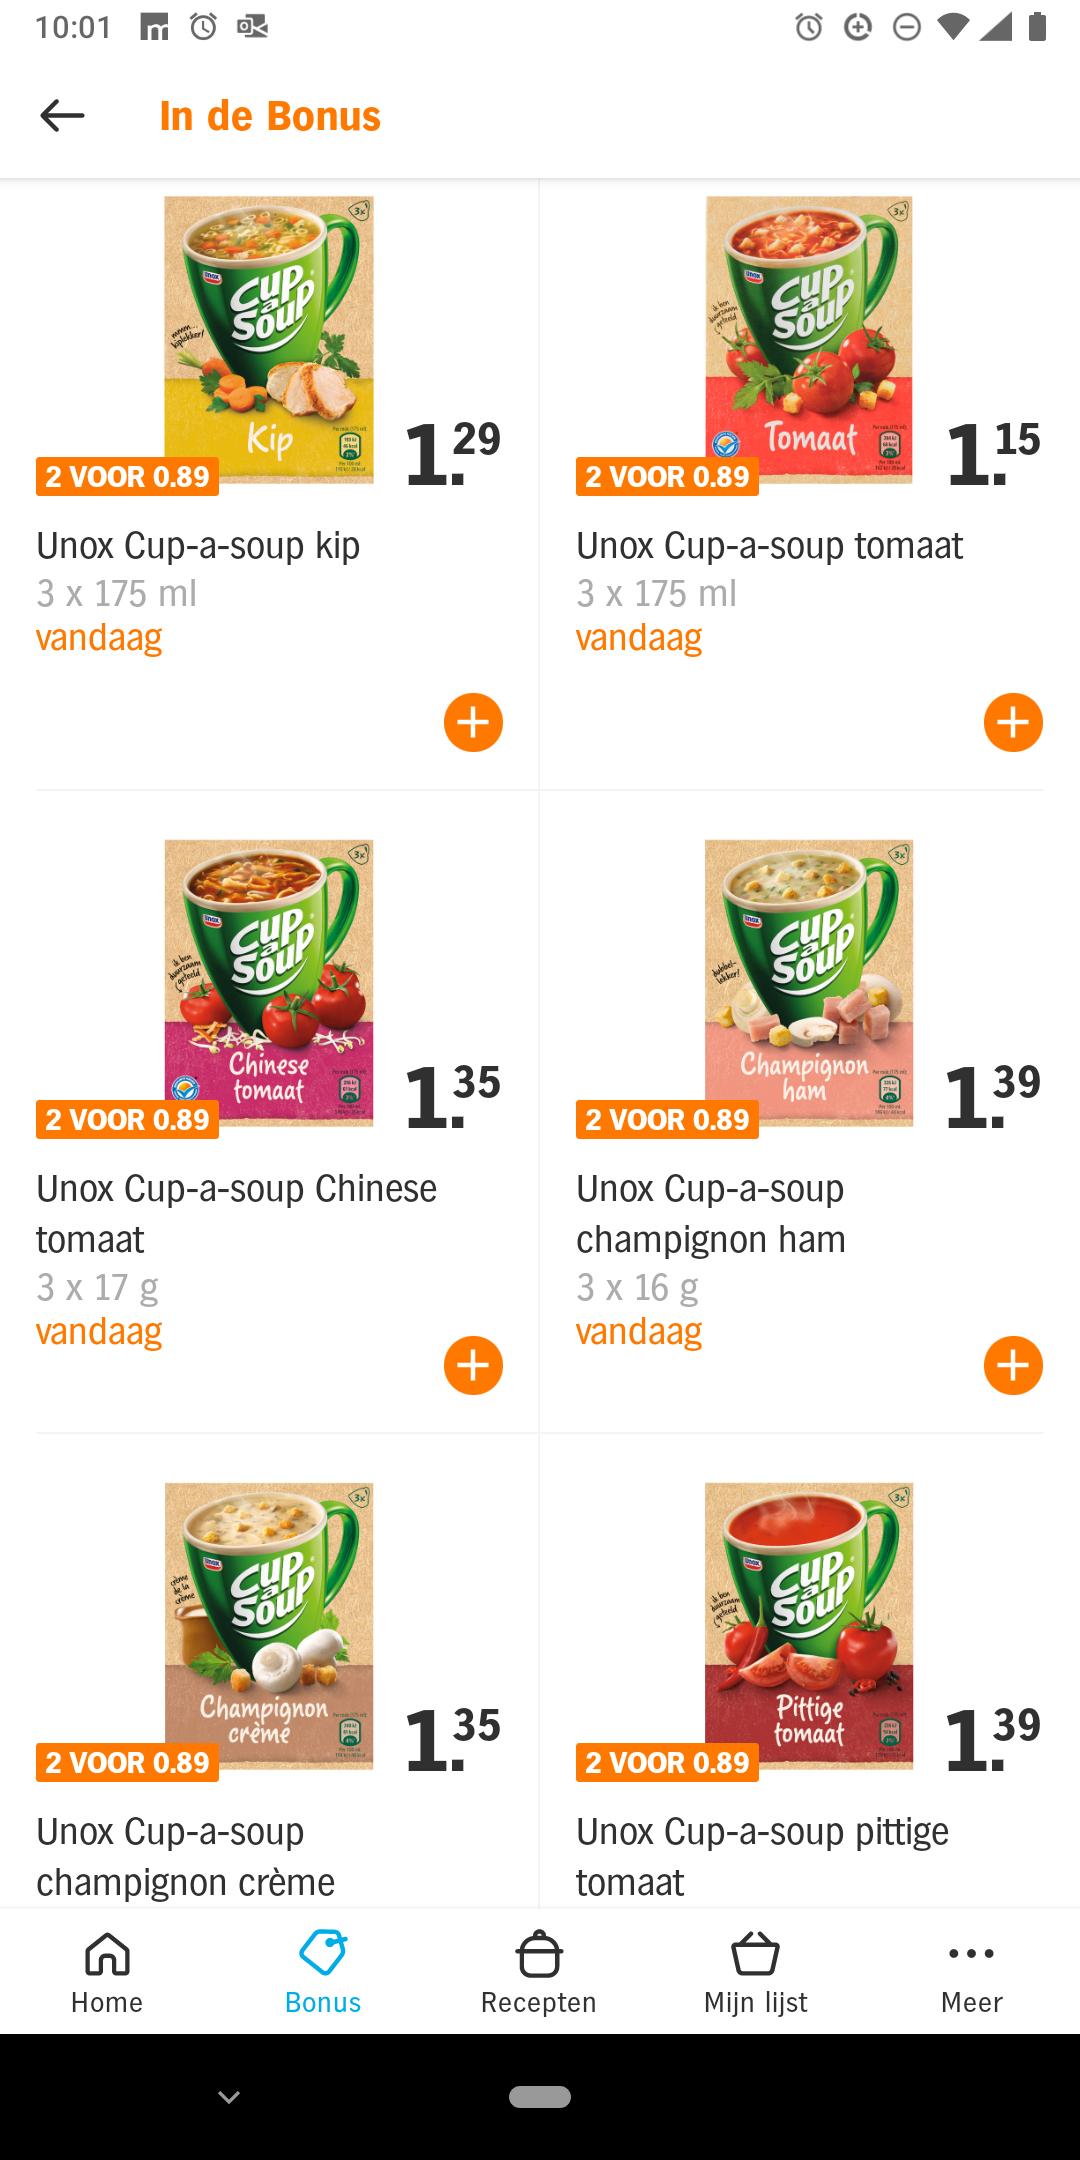 Dagaanbieding cup a soup 2 pakjes voor 89 cent @ Albert Heijn